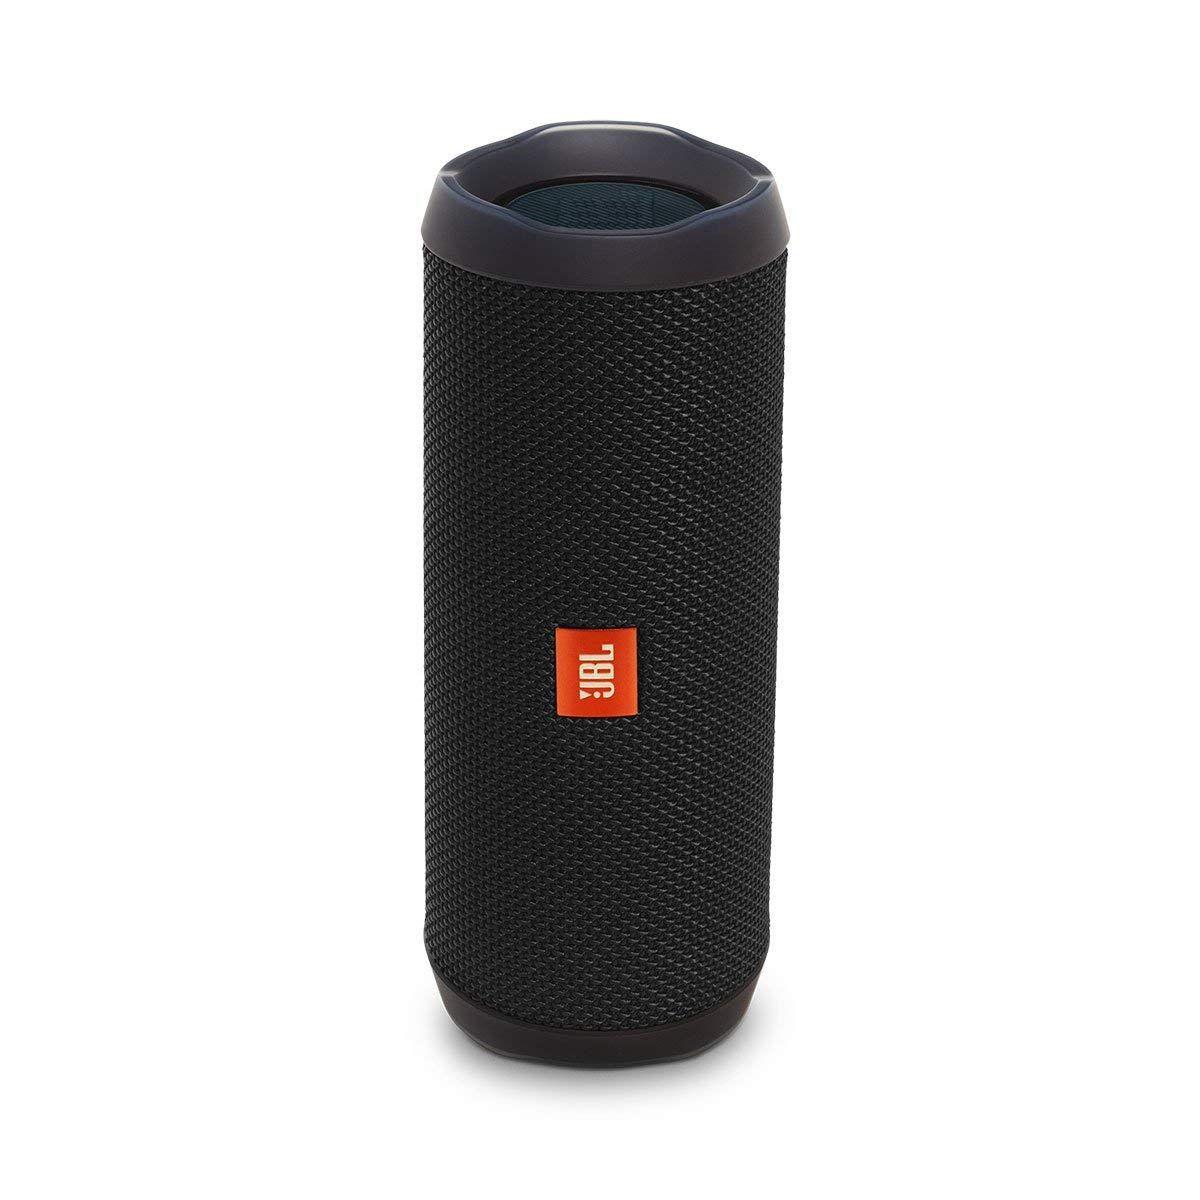 Black JBL Flip 4 Splashproof Smart Speaker JBLXTREMEBLKUS